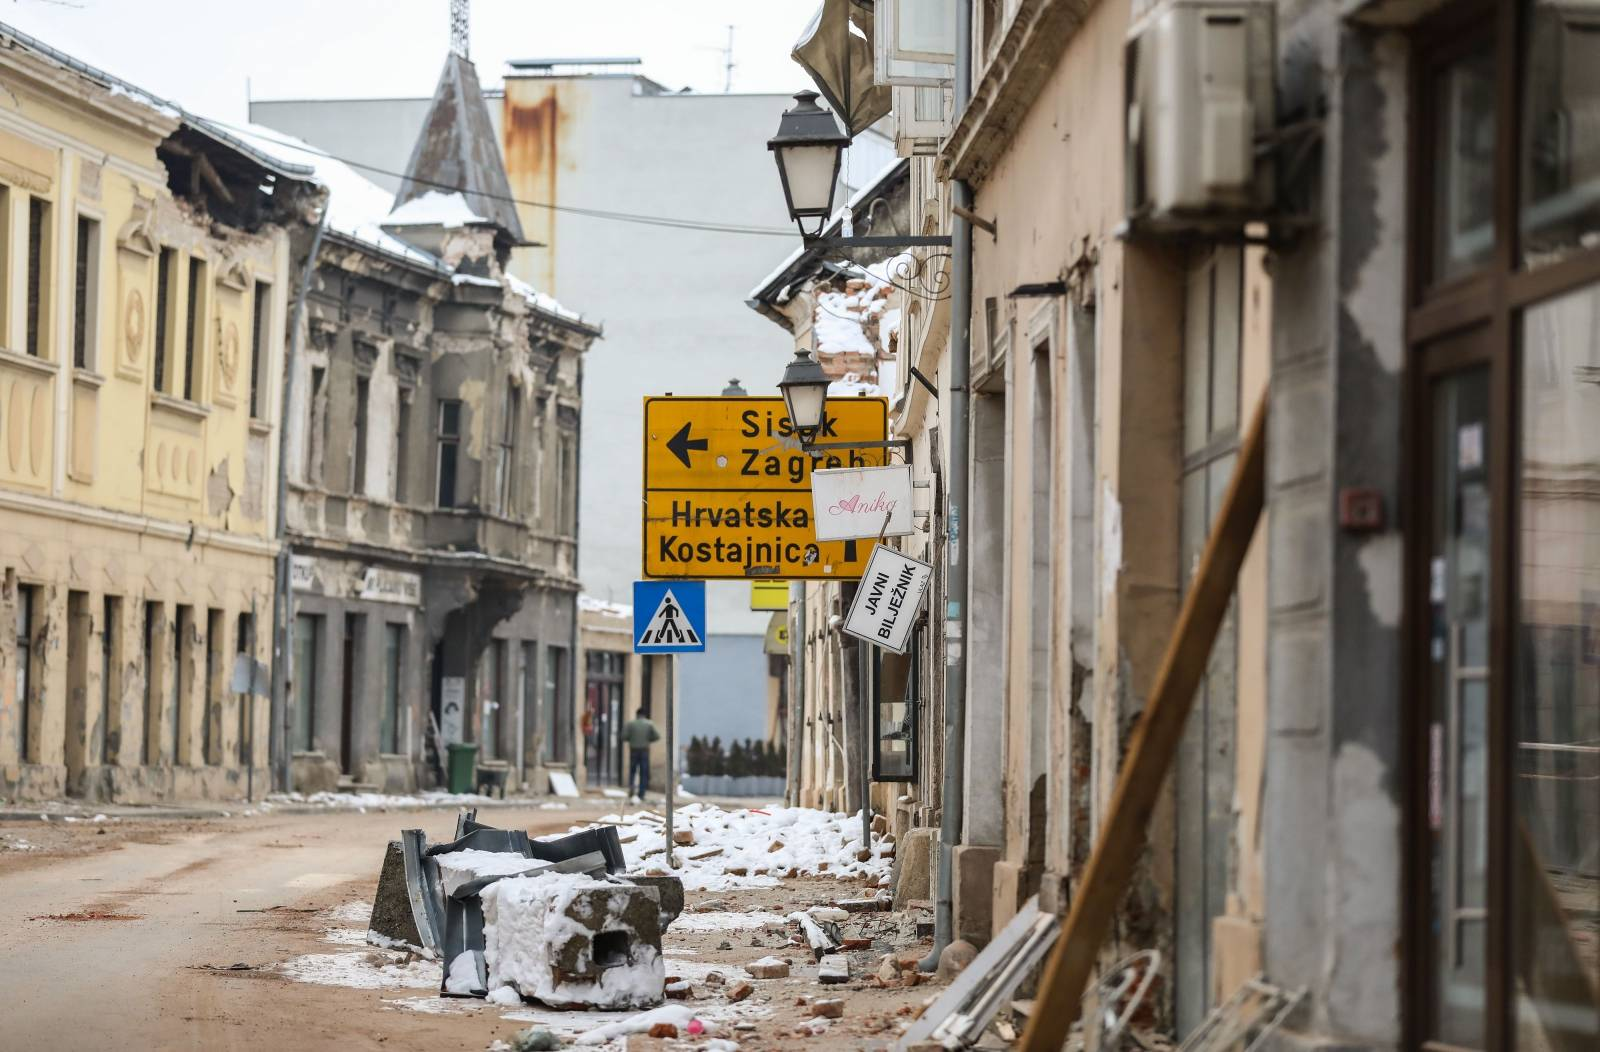 Live Donacija Iz Njemacke Vec Sutra Dolazi Prva Posiljka Kontejnera 24sata